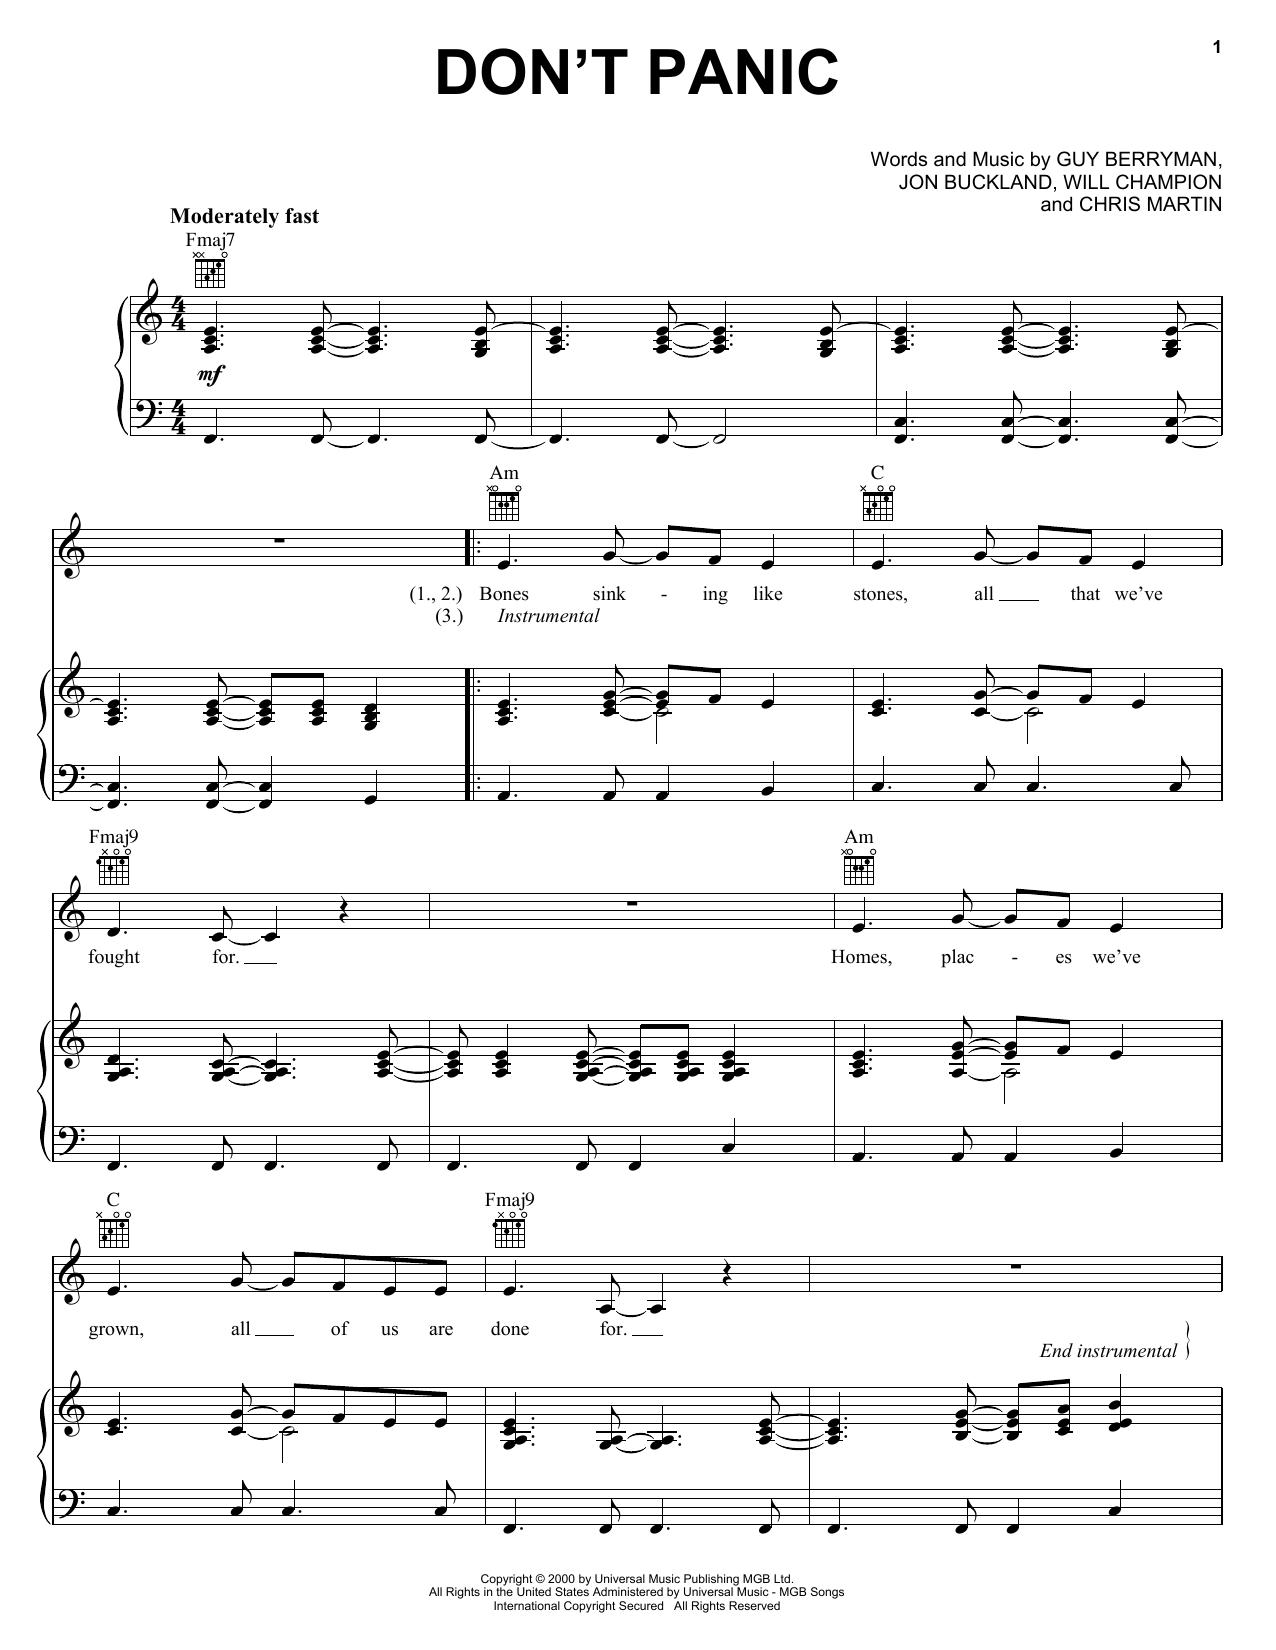 christmas light coldplay lyrics 95 jeep grand cherokee radio wiring diagram don 39t panic sheet music direct